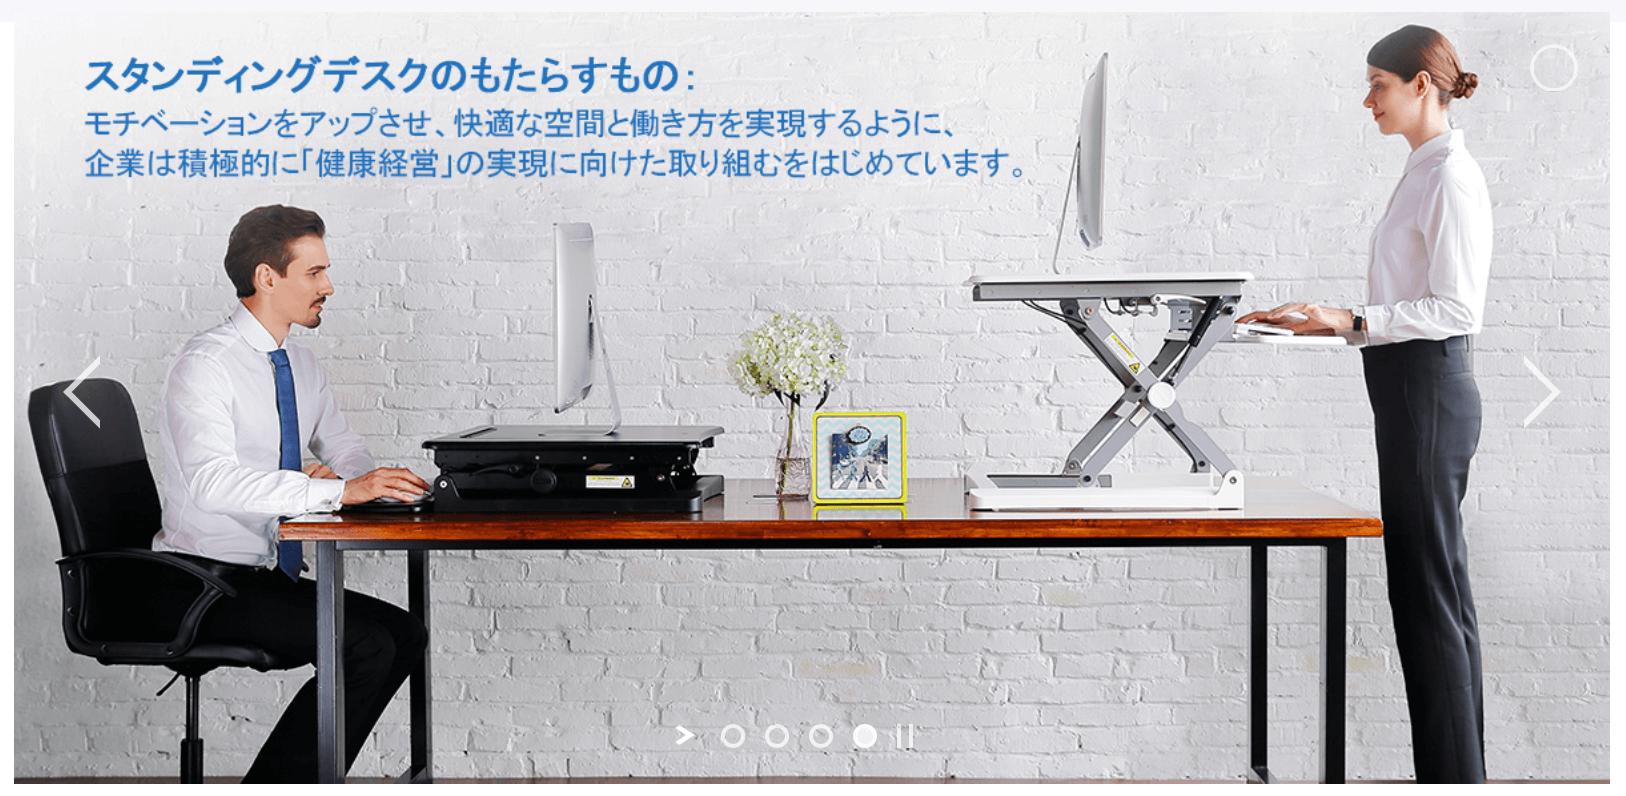 FLEXISPOT 座位・立位両用スタンディングデスク 画像